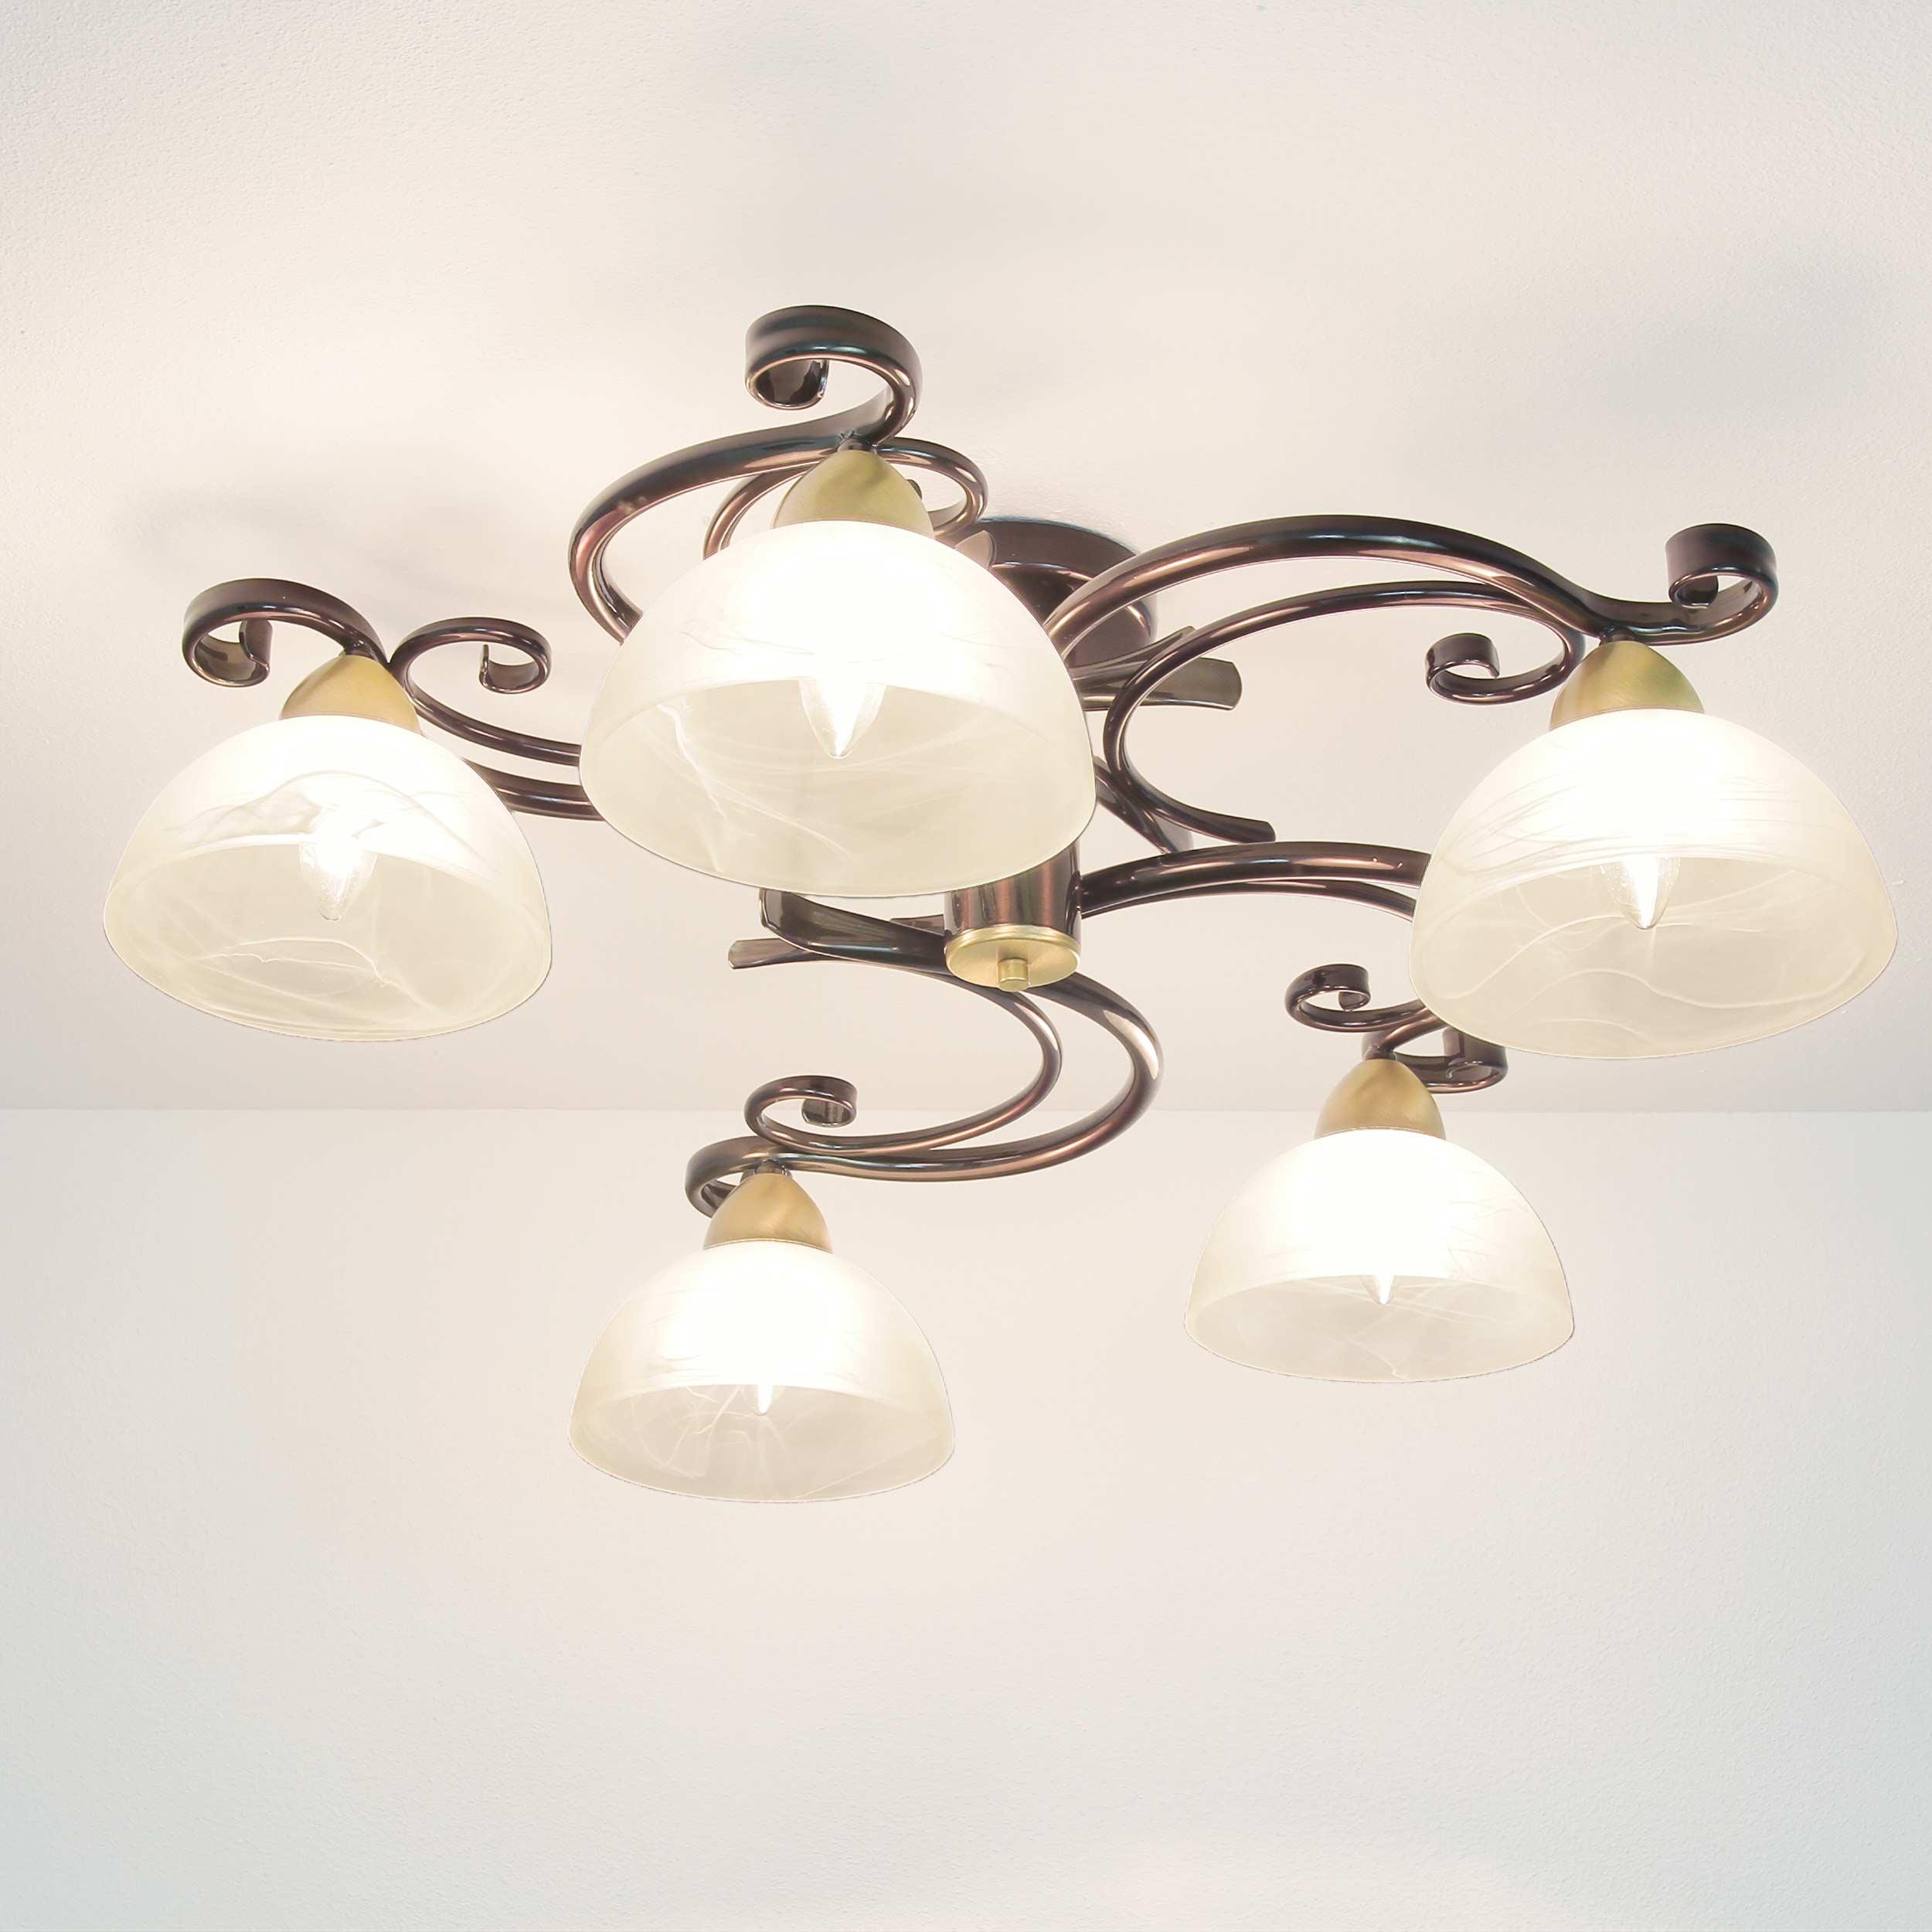 Deckenleuchte Landhaus rustikal Ø78cm 5x E27 Lampe Decke Messing Floral Glas   eBay